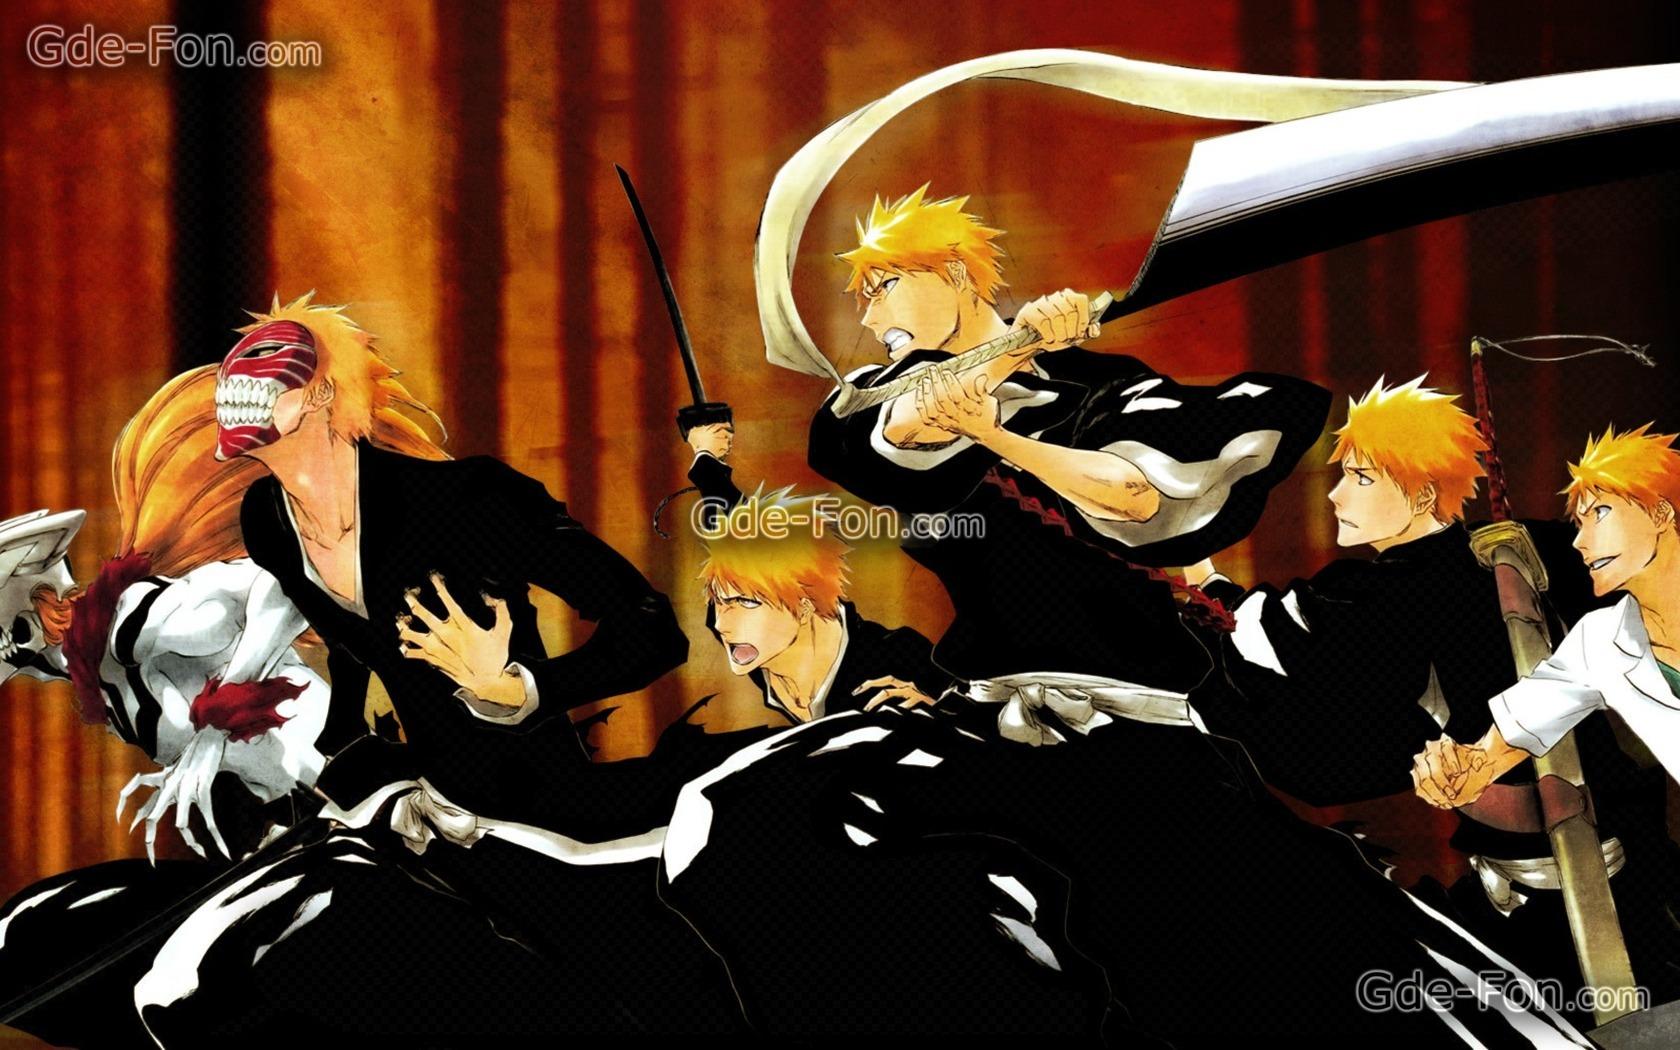 Cool Guy Anime Wallpaper 14 Widescreen Wallpaper